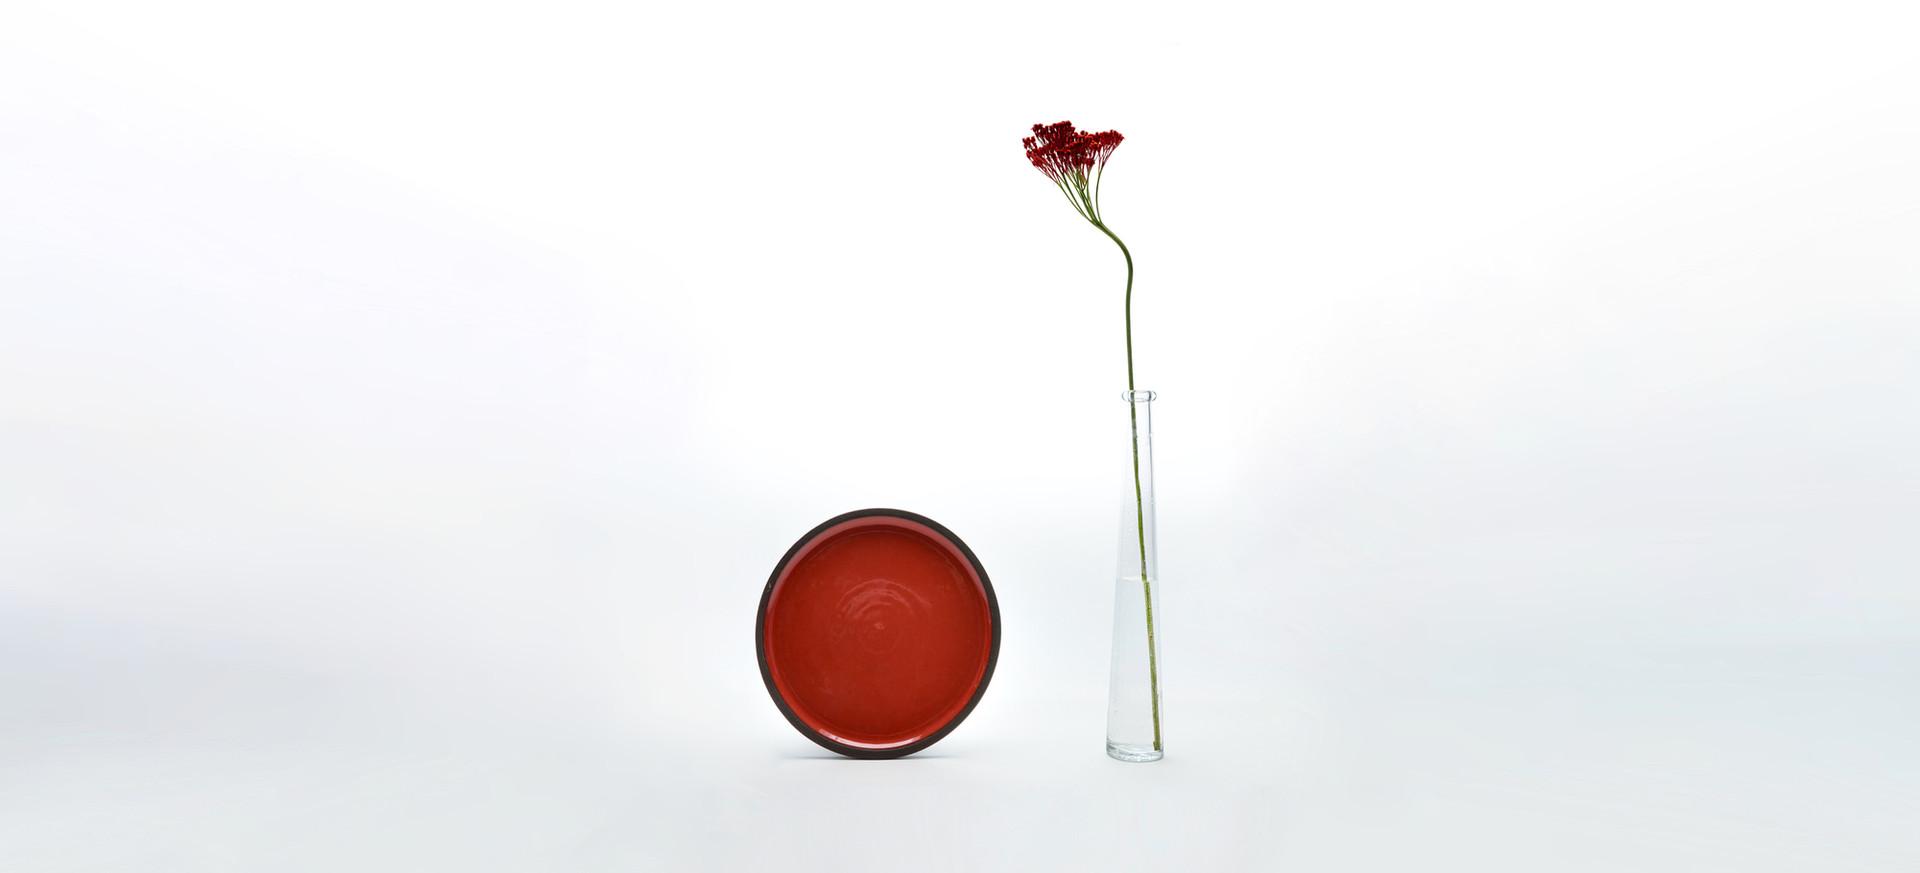 Flower_small.jpg